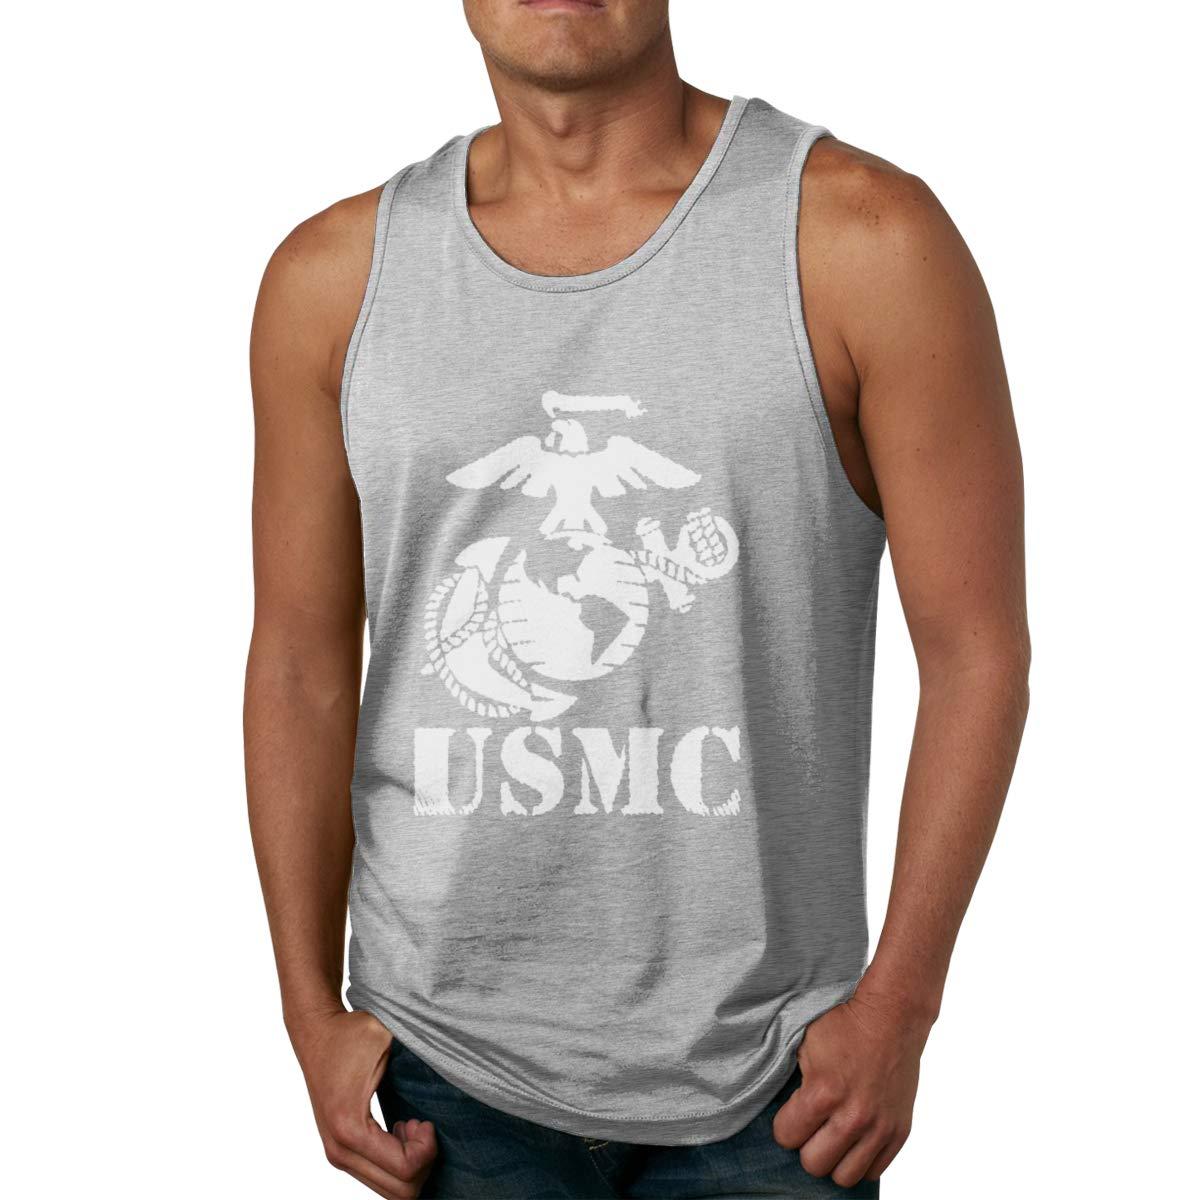 Seuriamin Usmc Corps S Comfortable Athletic Sleeveless Tank Top T Shirts